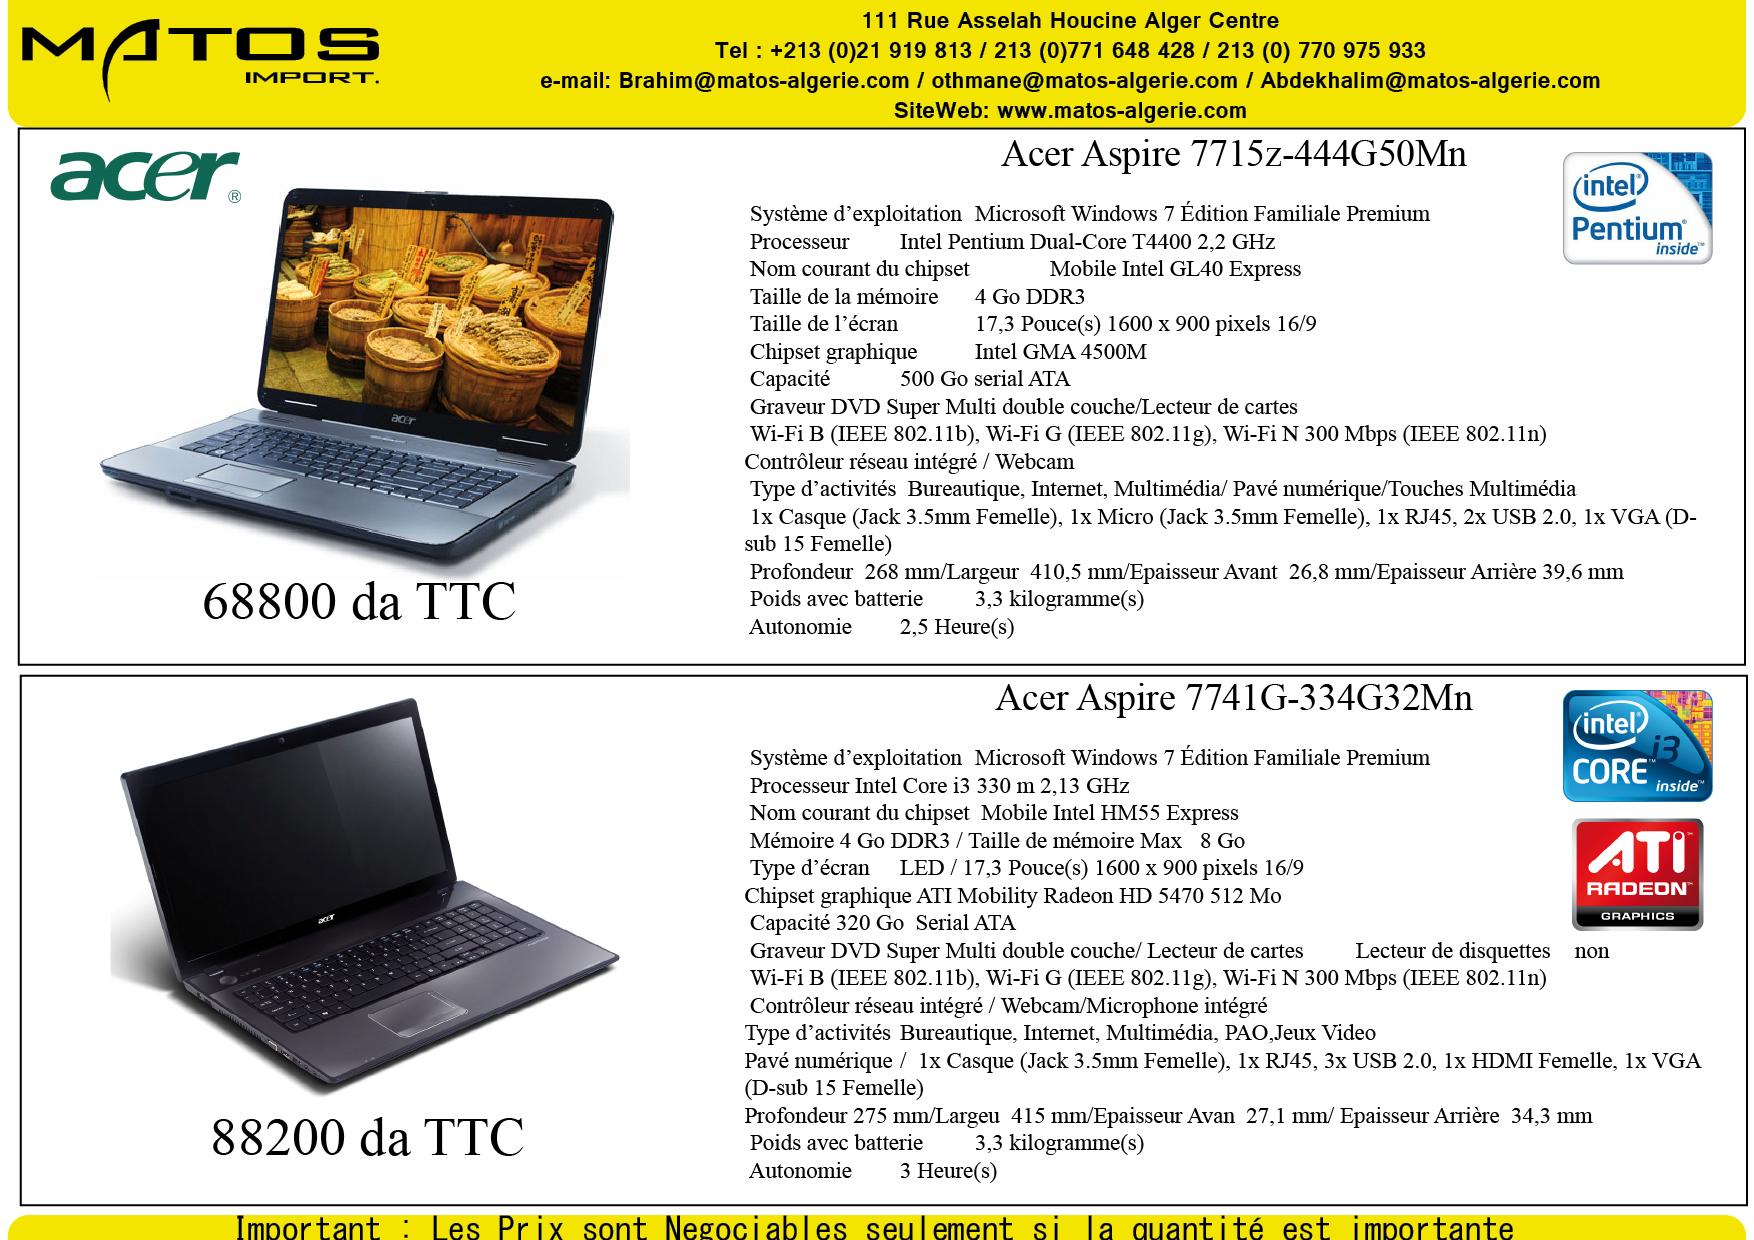 Laptop msi et acer